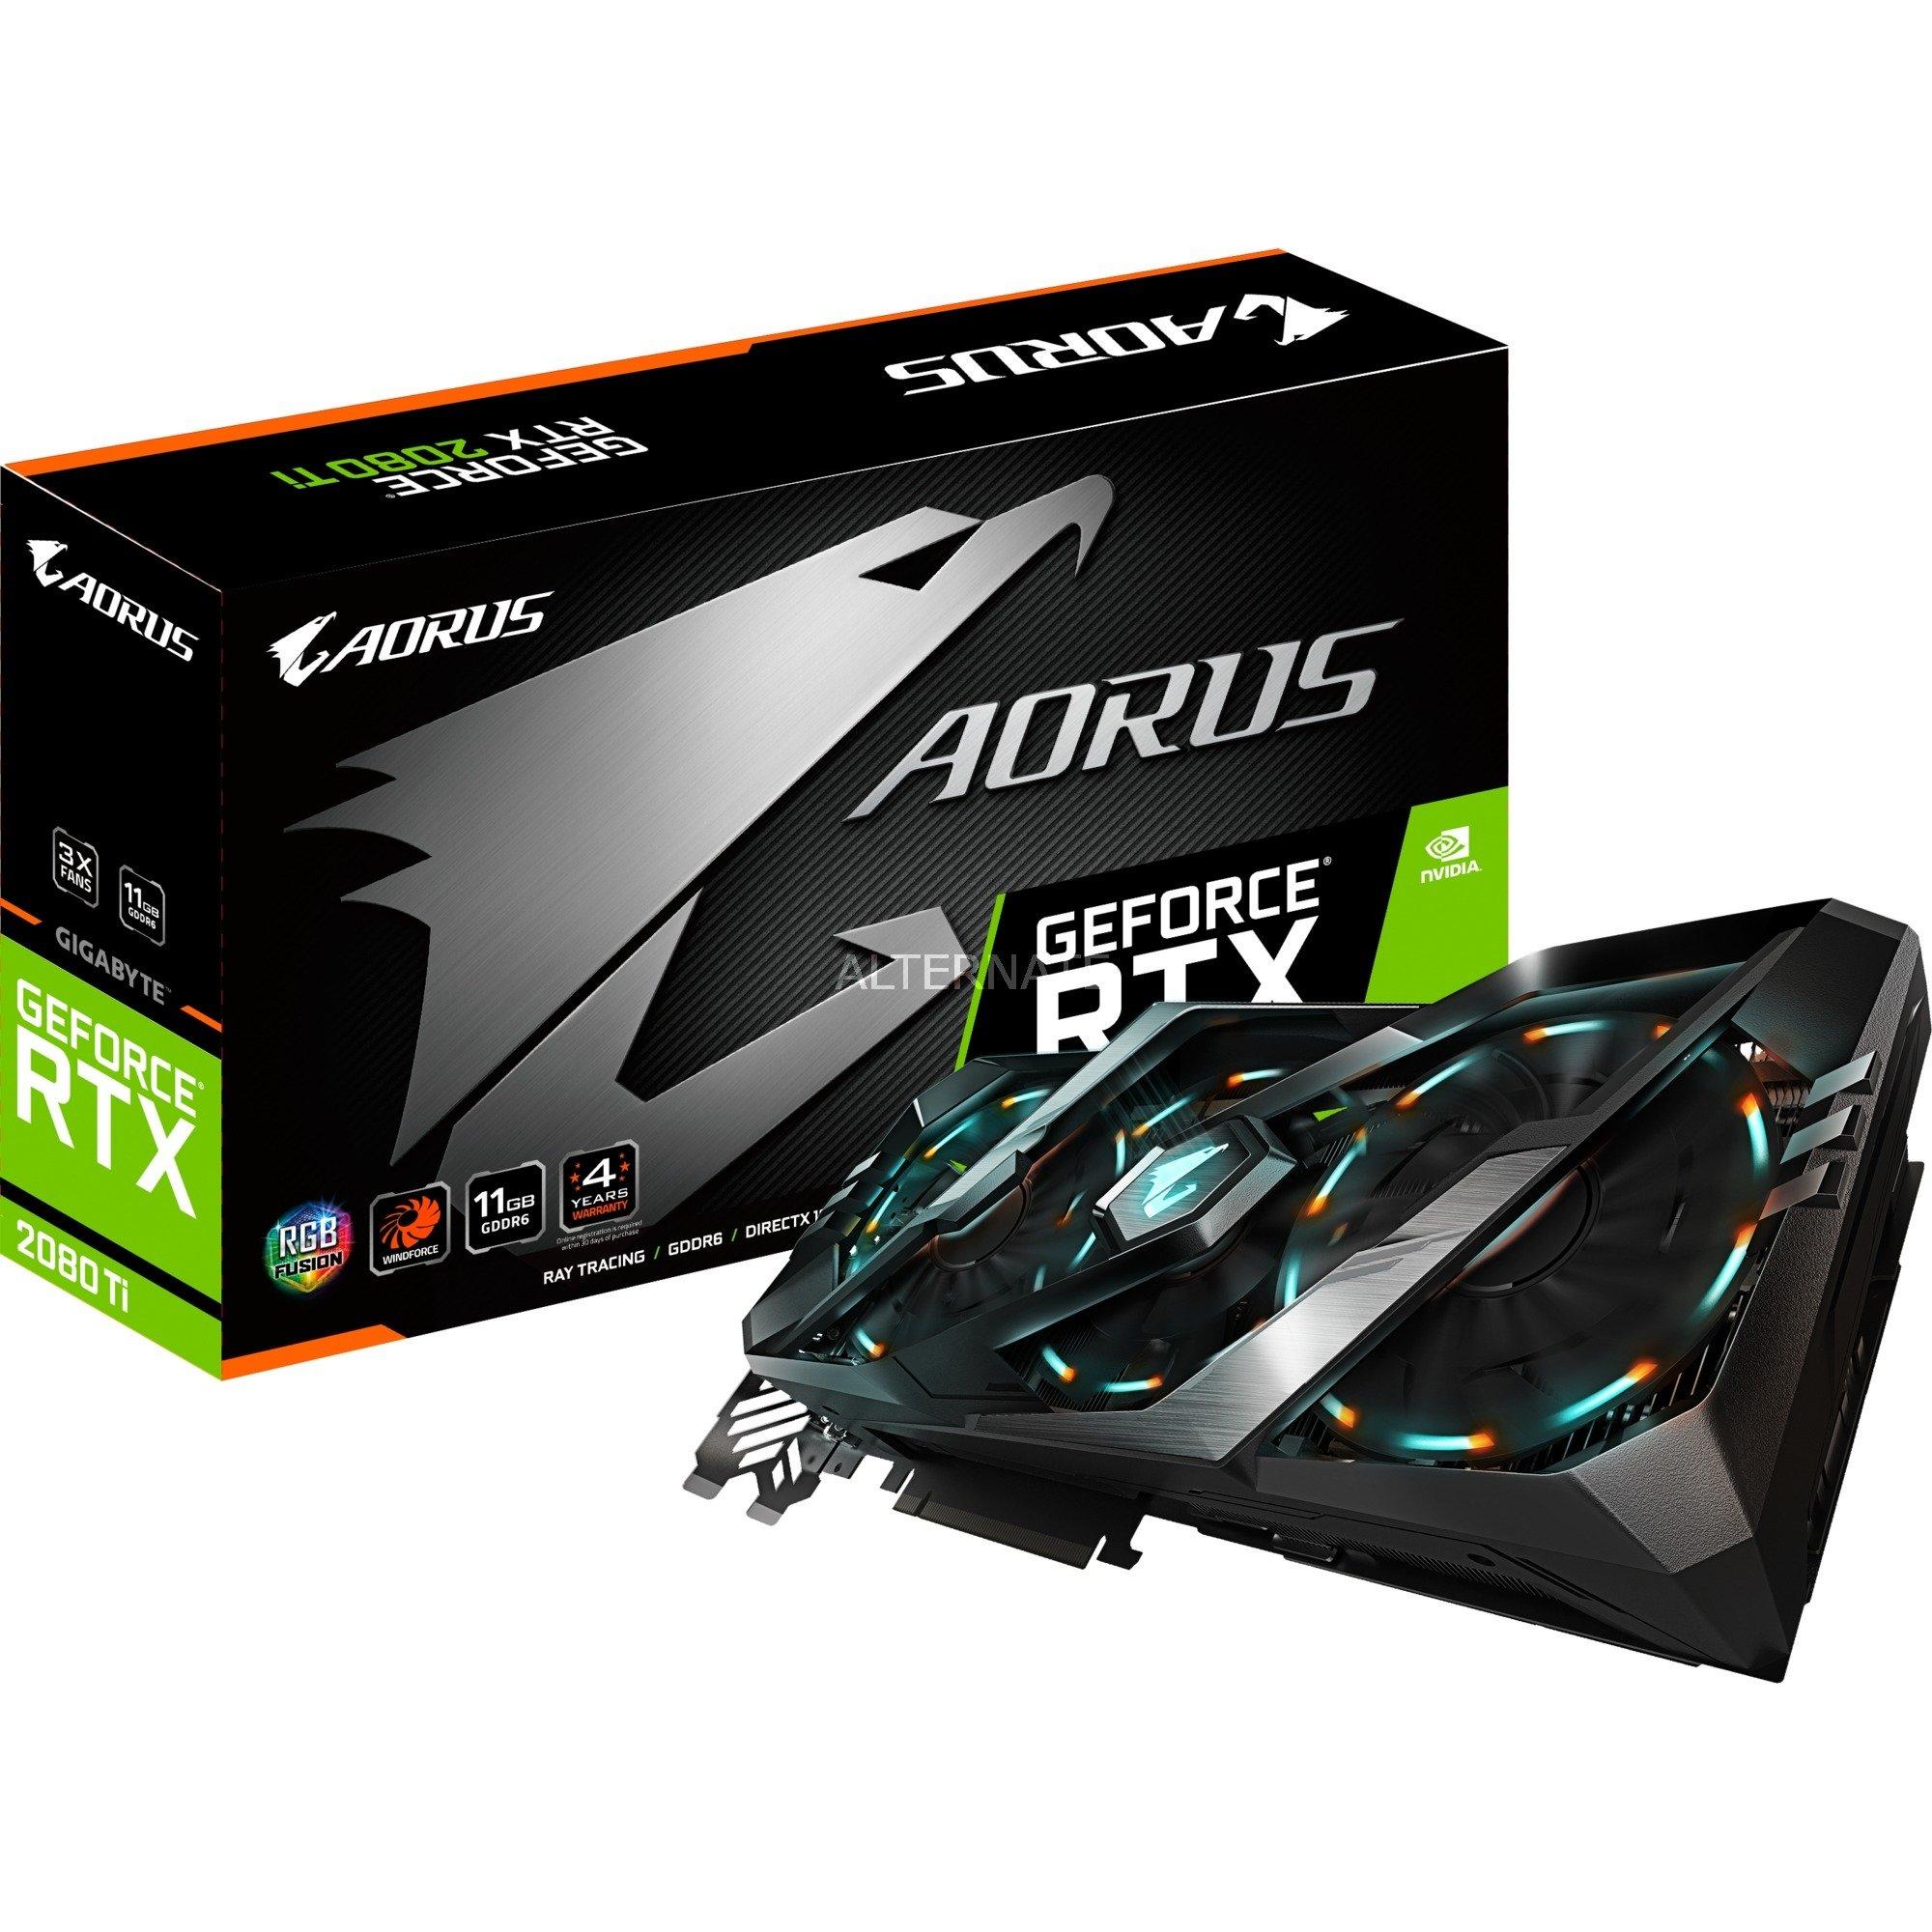 AORUS GeForce RTX 2080 Ti 11GB, Tarjeta gráfica